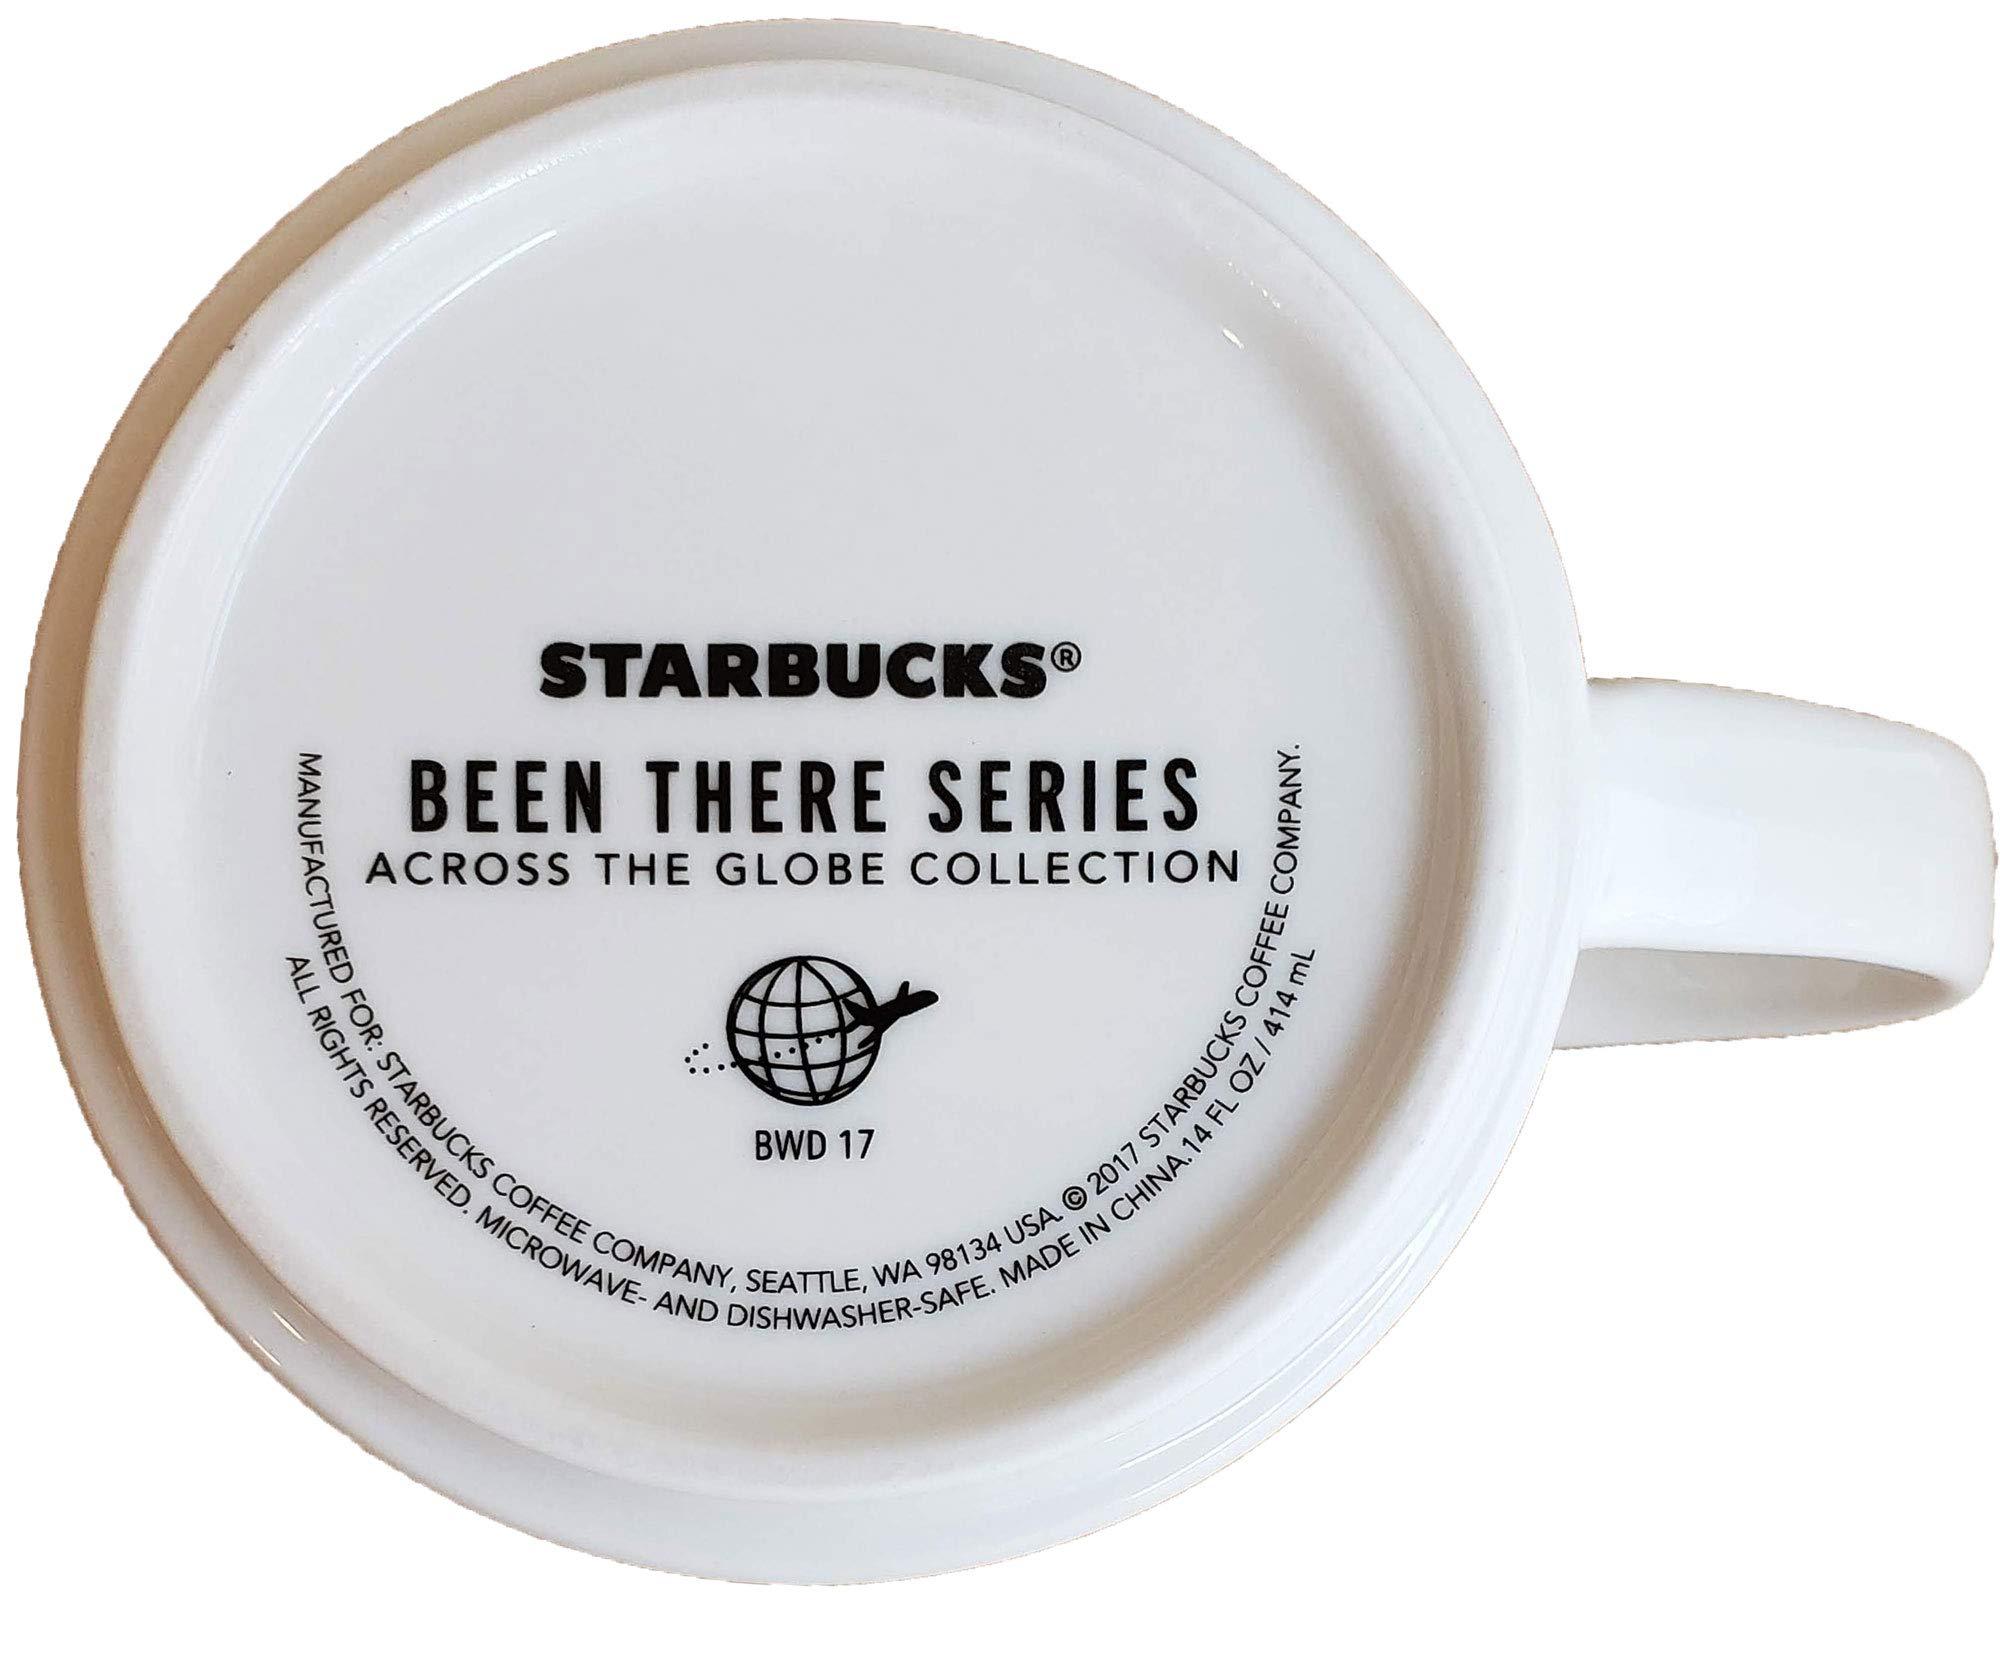 Starbucks Austin Coffee Mug - Been There Series by Starbucks (Image #3)